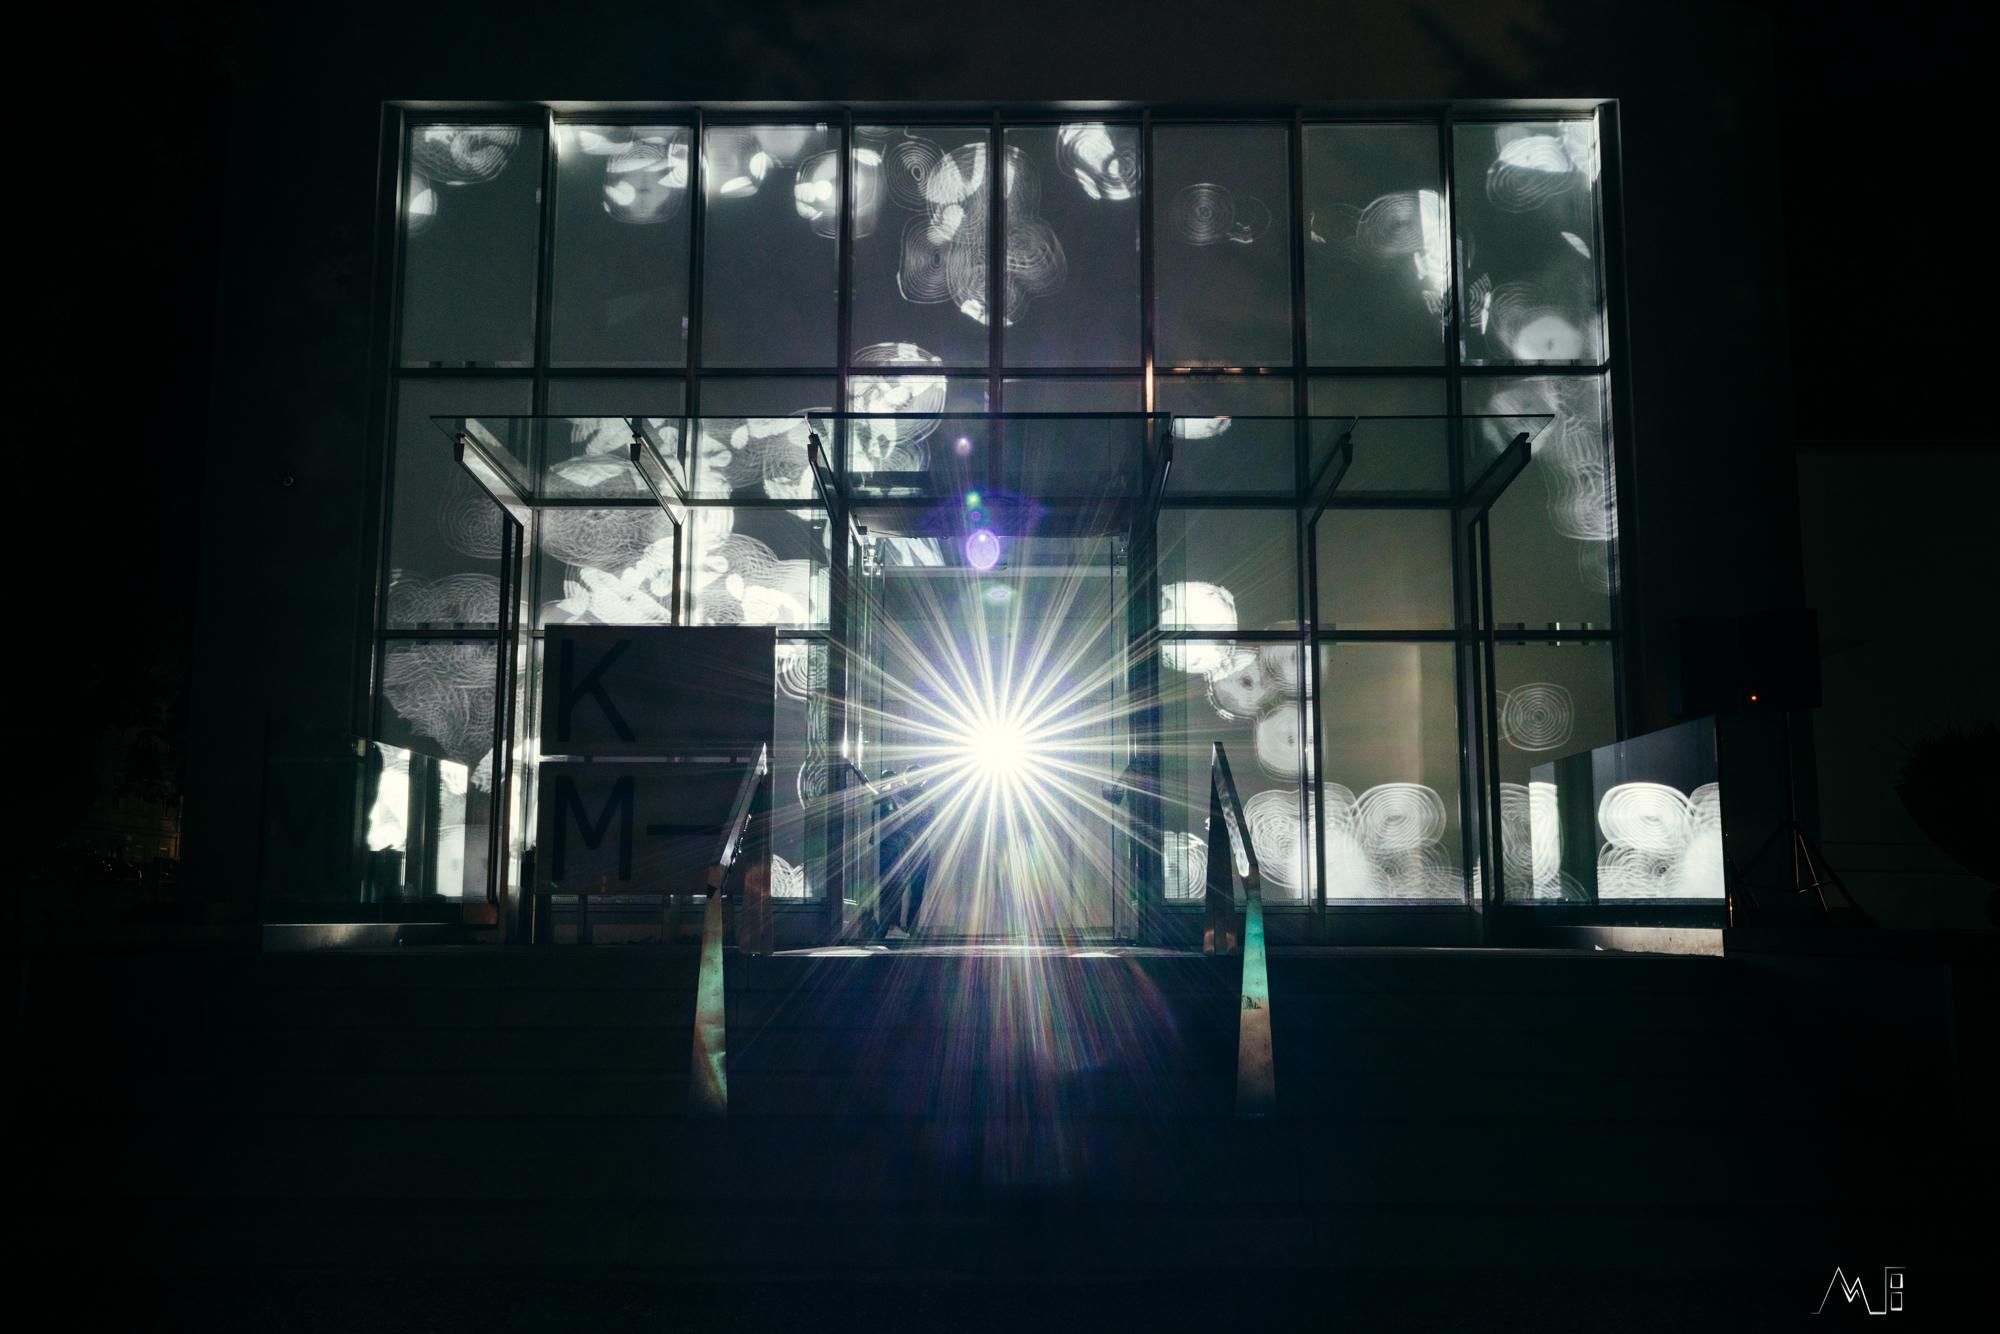 Klanglicht-2019-3522.jpg